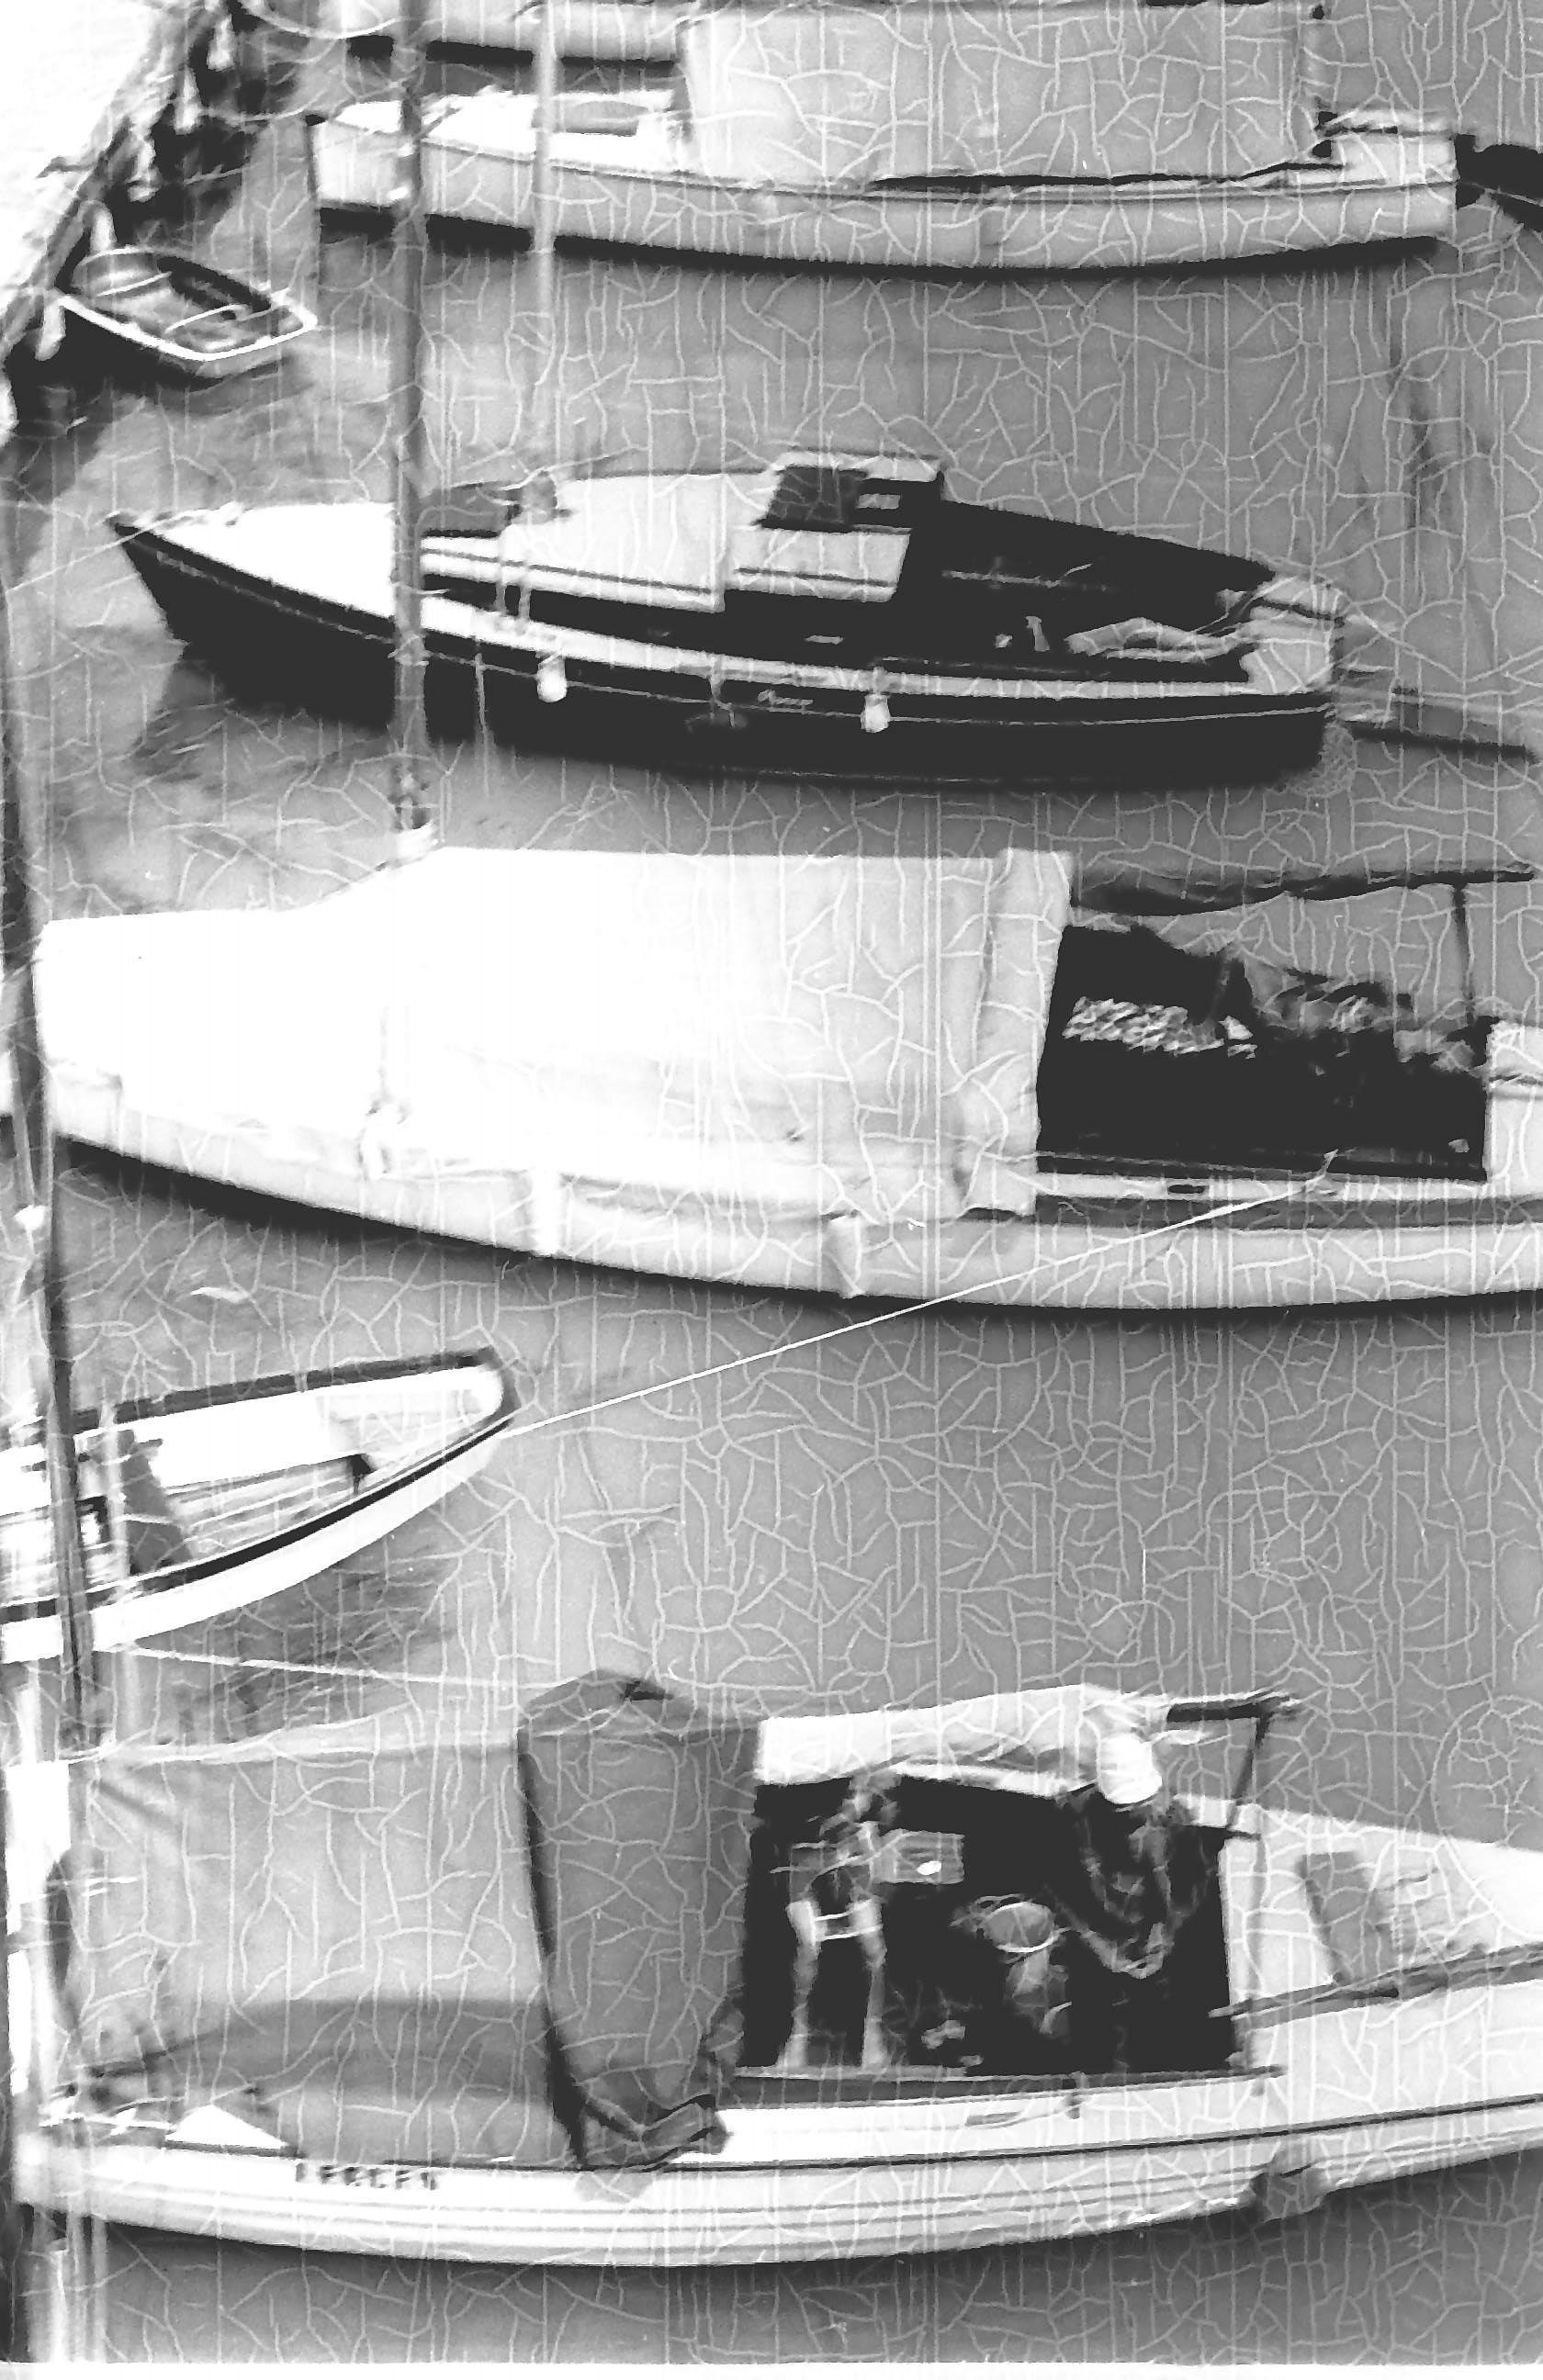 siofok_1973.jpg